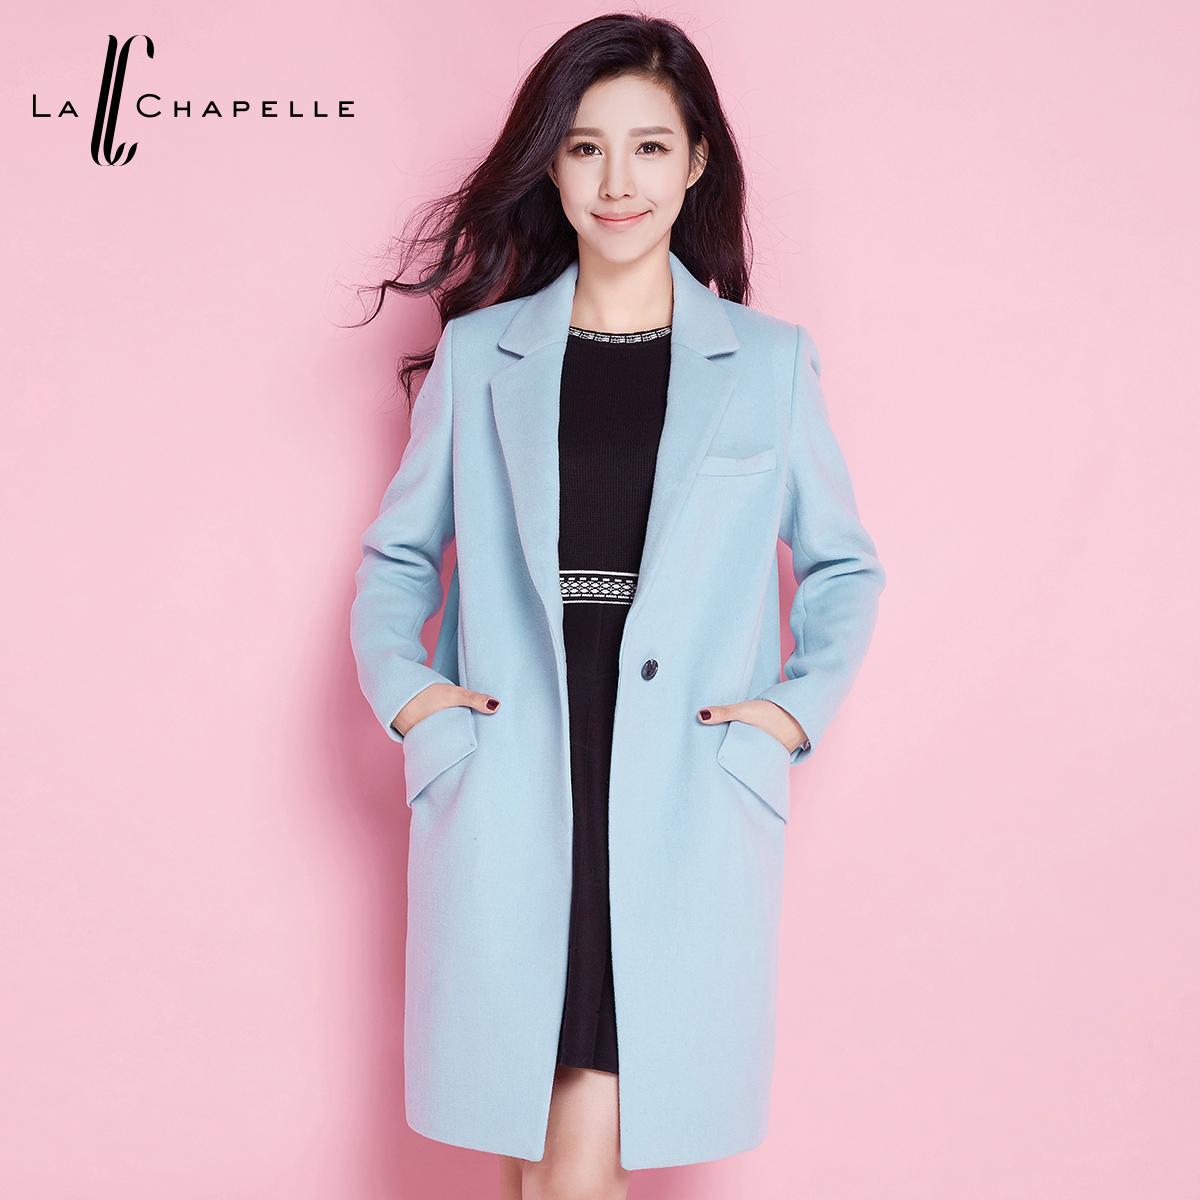 La Chapelle/拉夏贝尔毛呢外套女装质量怎么样,是什么牌子